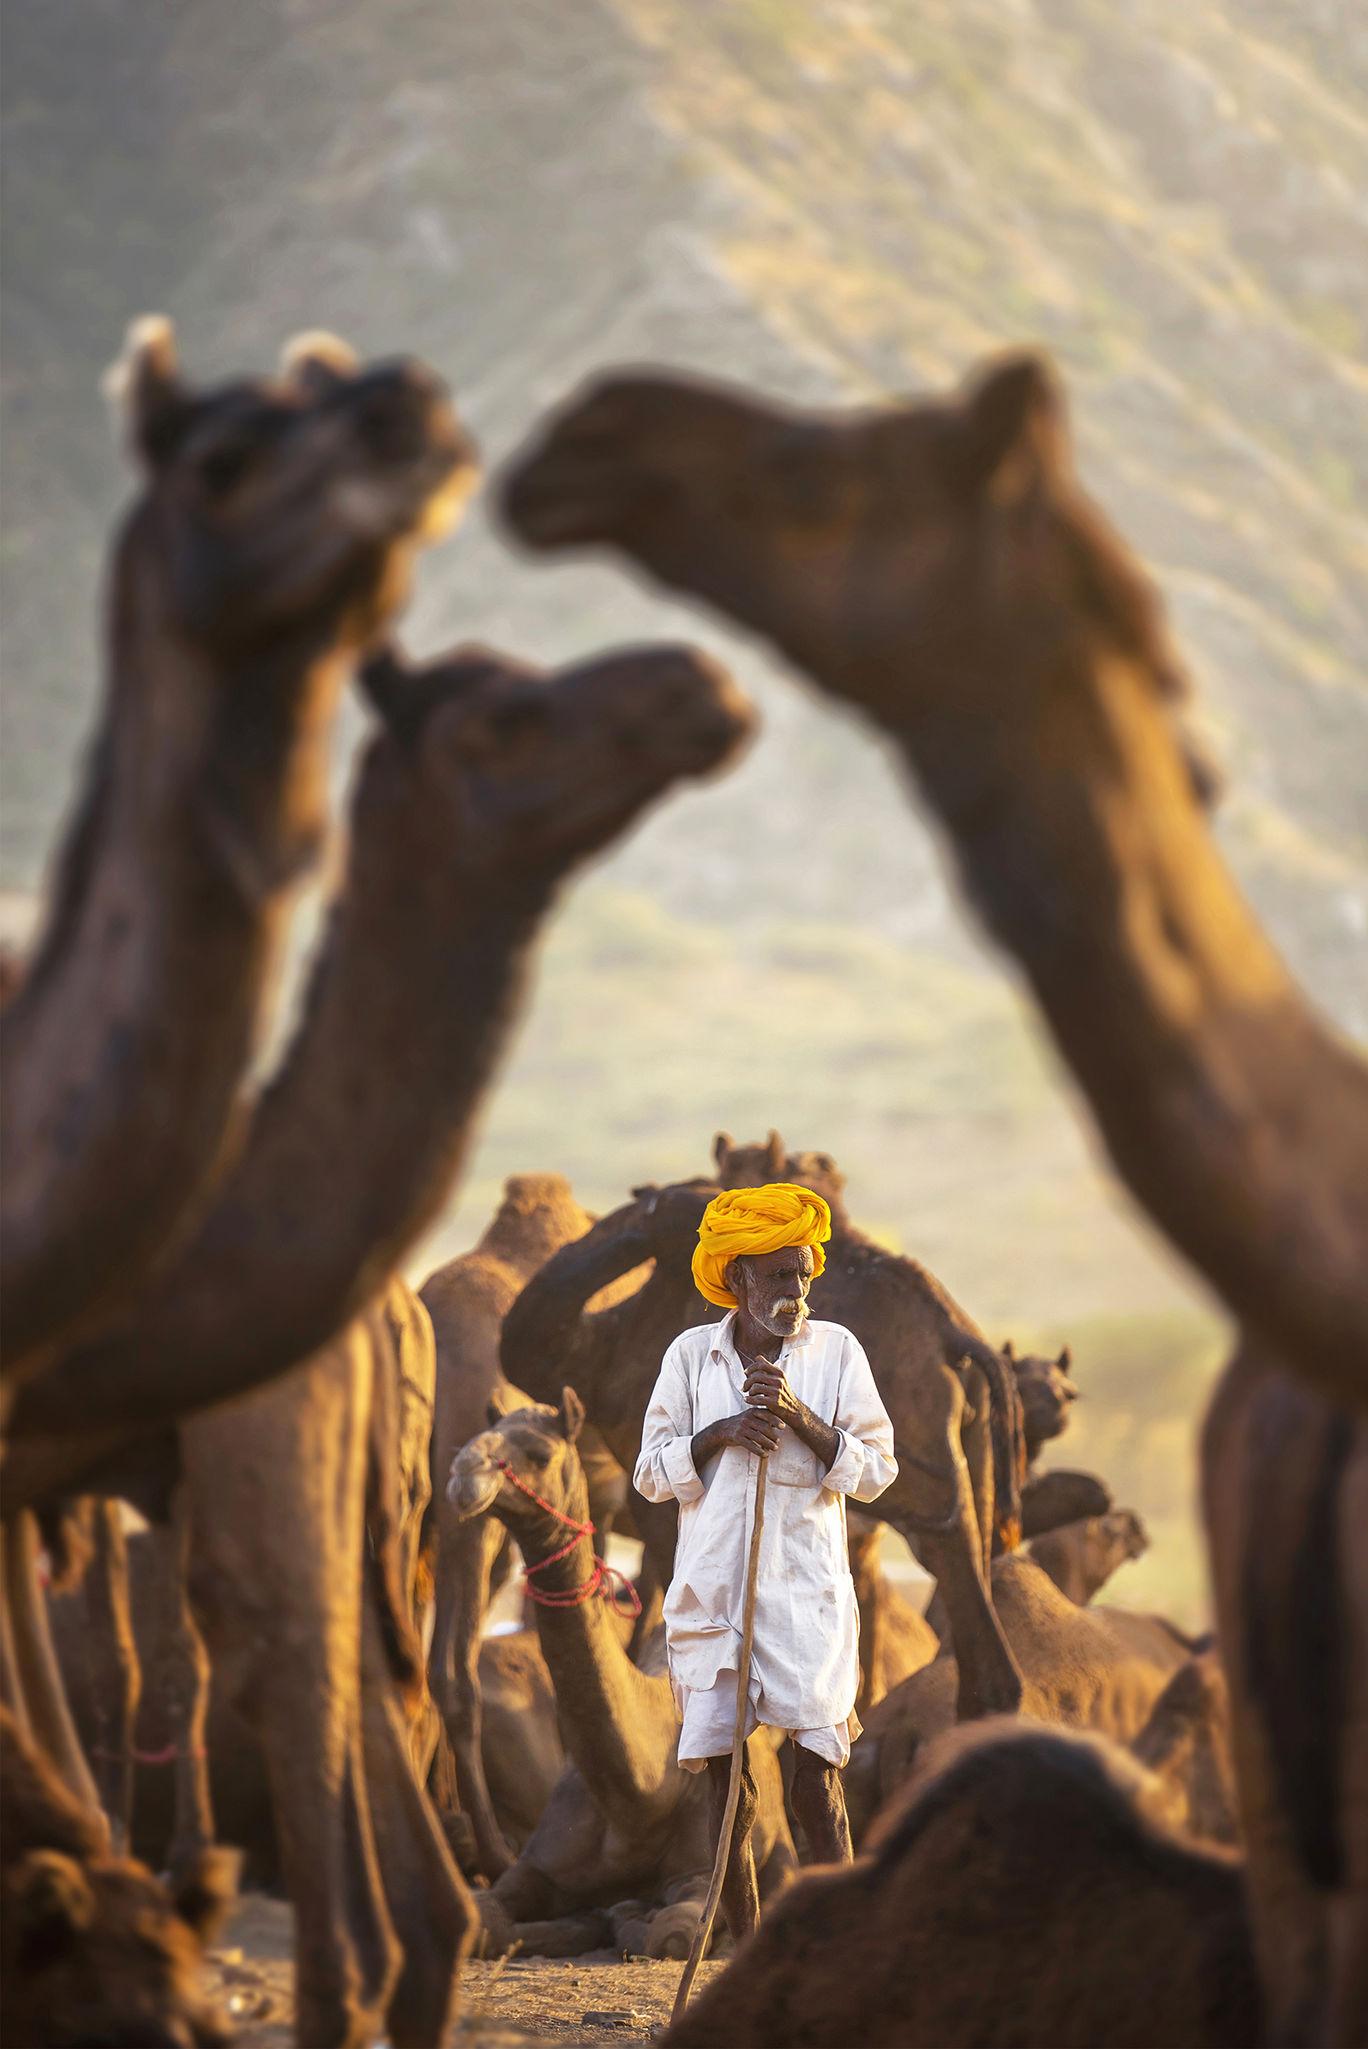 Photo of Pushkar By sourabhgandhi